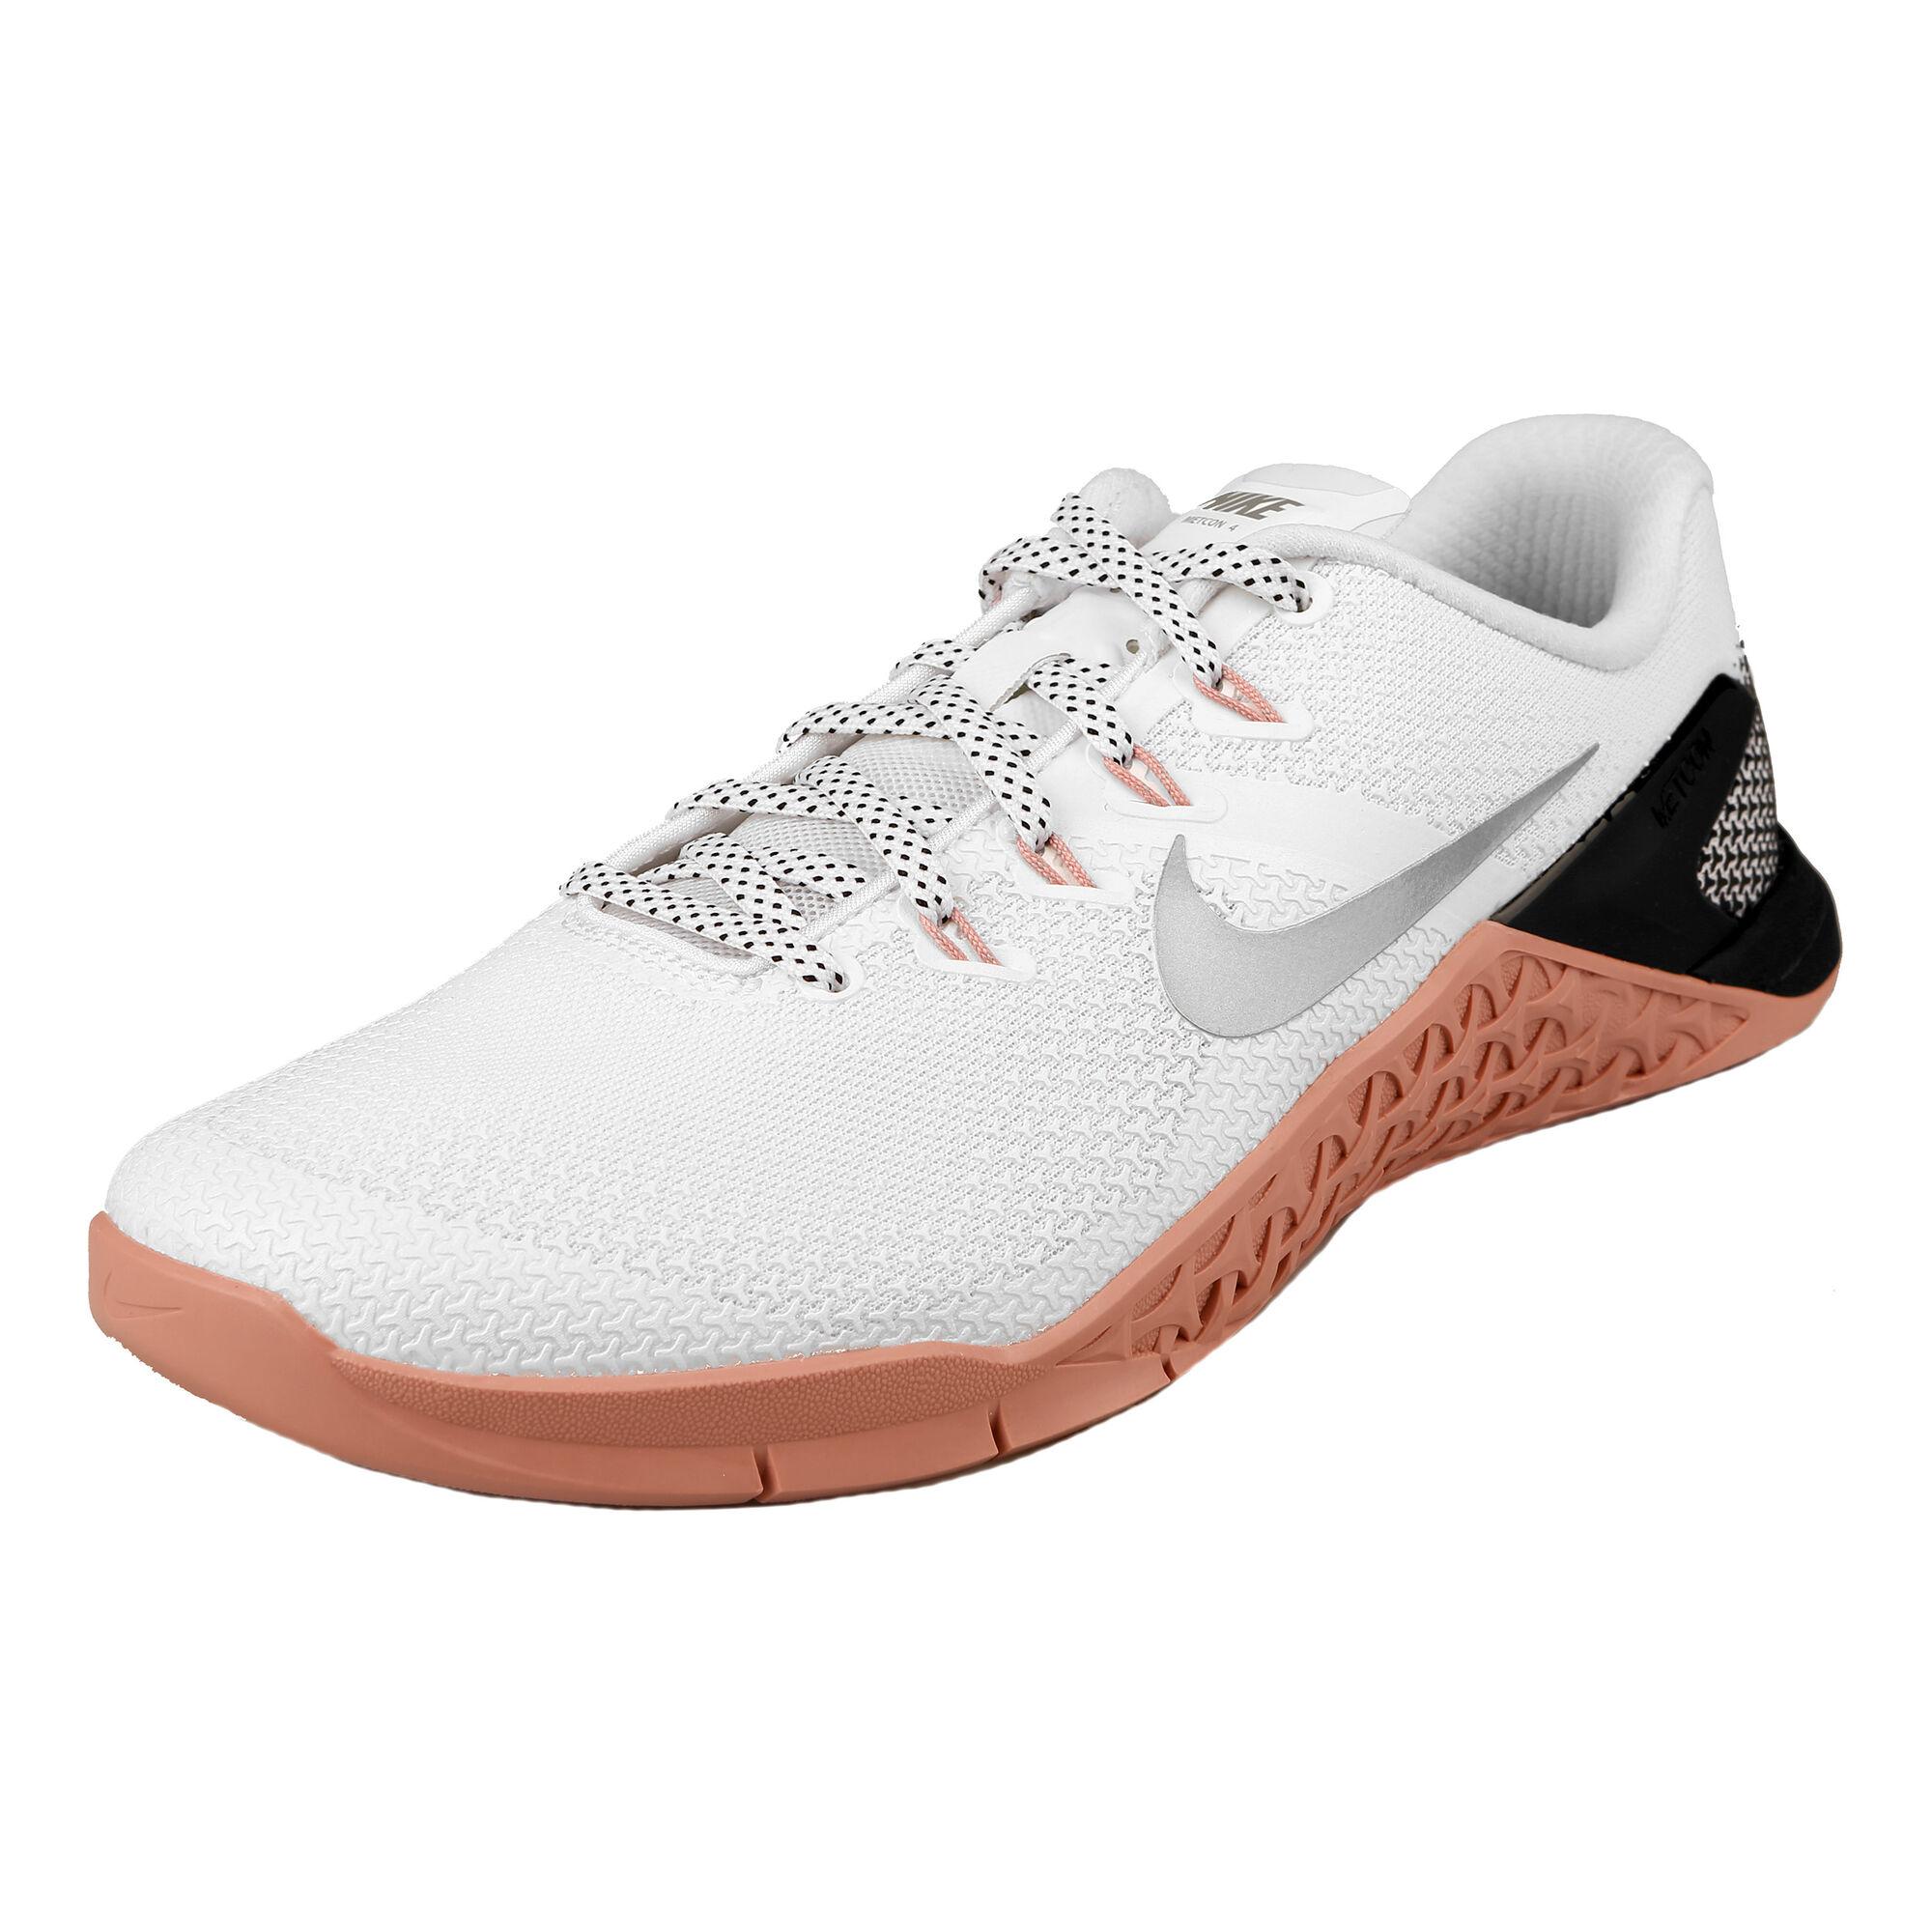 b998497412050 buy Nike Metcon 4 Fitness Shoe Women - White, Pink online | Jogging ...